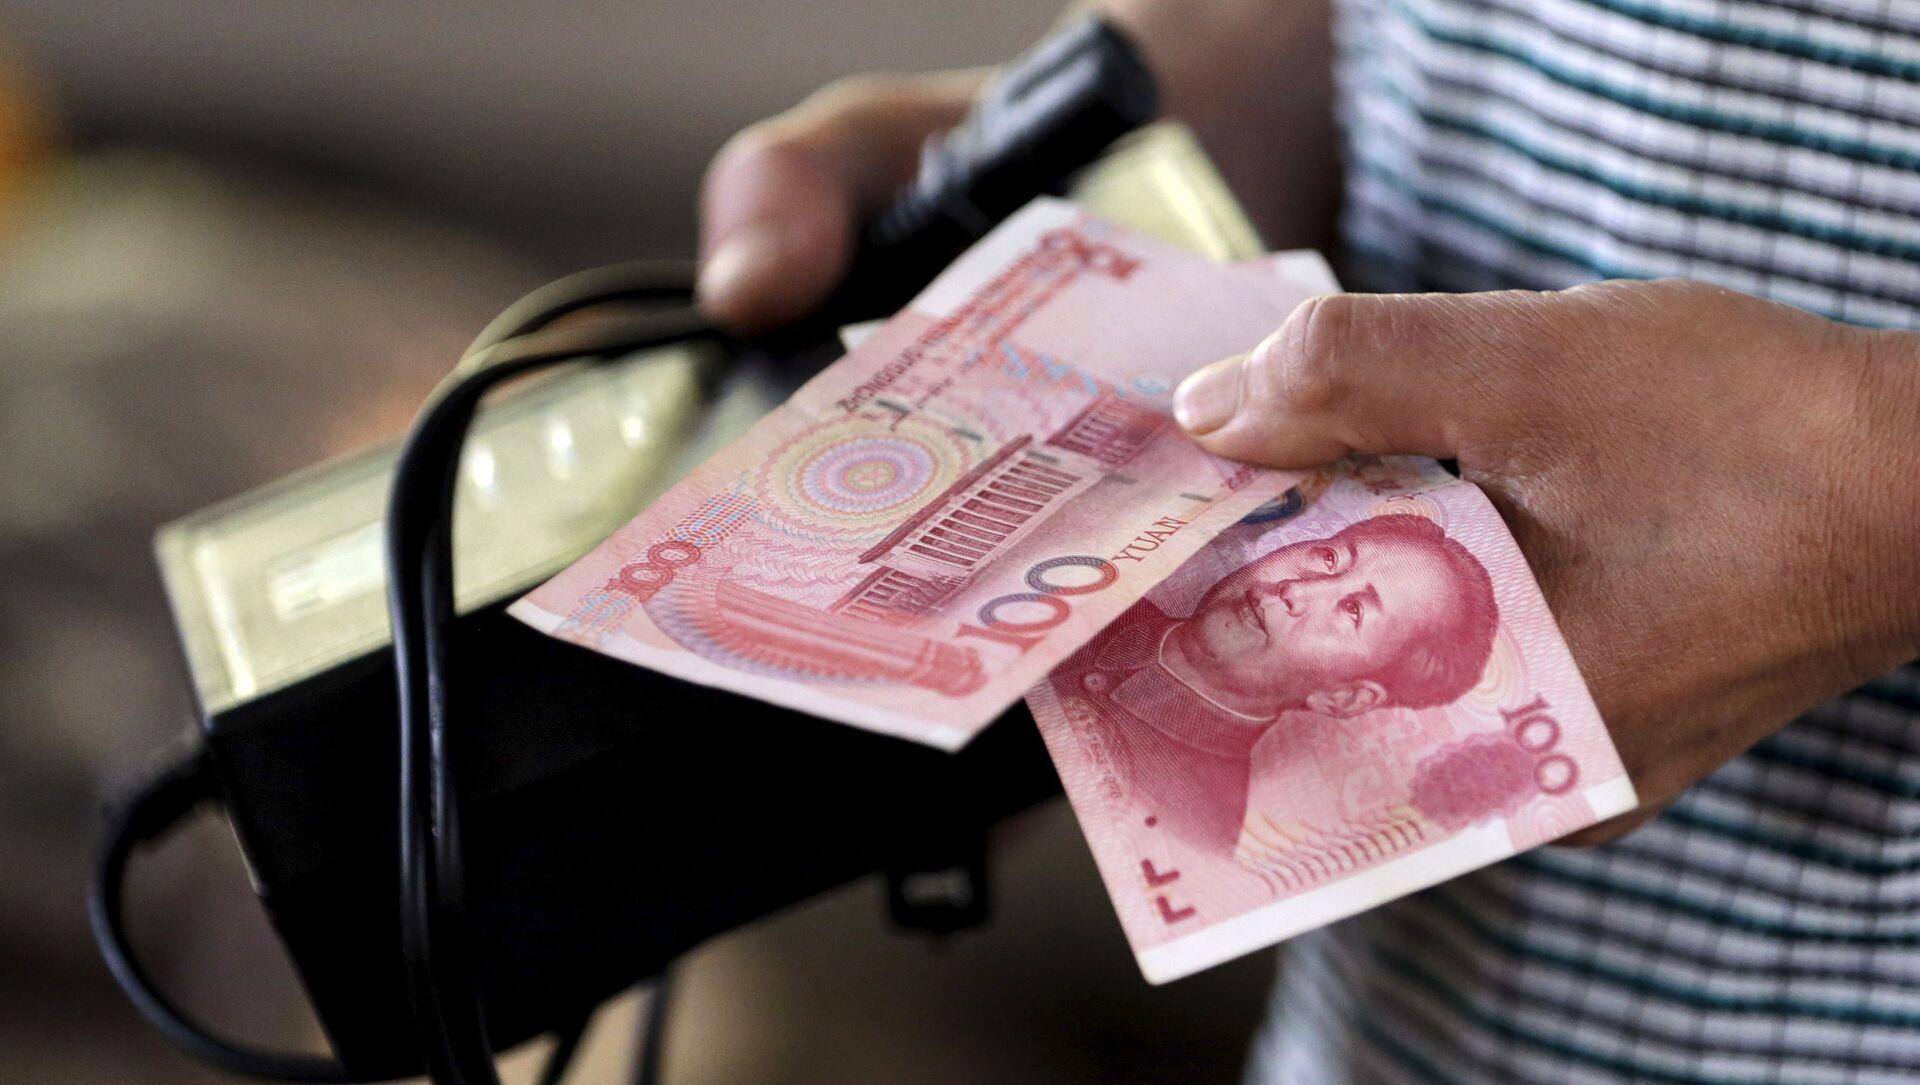 A customer holds a 100 Yuan note at a market in Beijing, August 12, 2015 - Sputnik Mundo, 1920, 22.11.2020